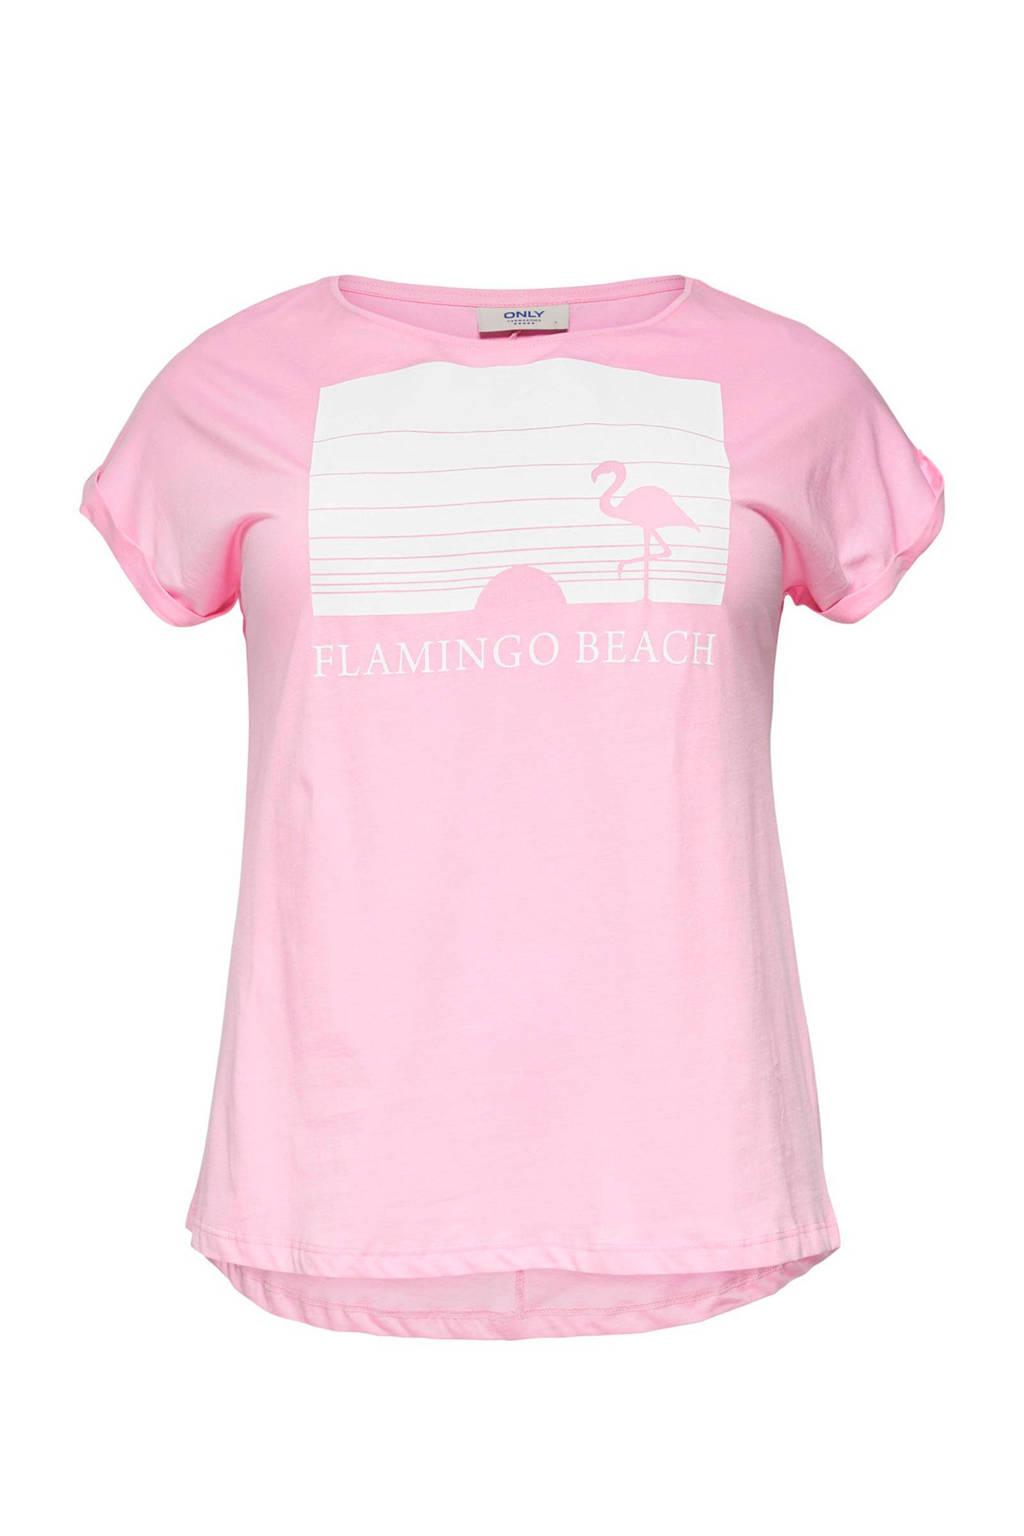 ONLY carmakoma T-shirt met printopdruk, roze/ wit